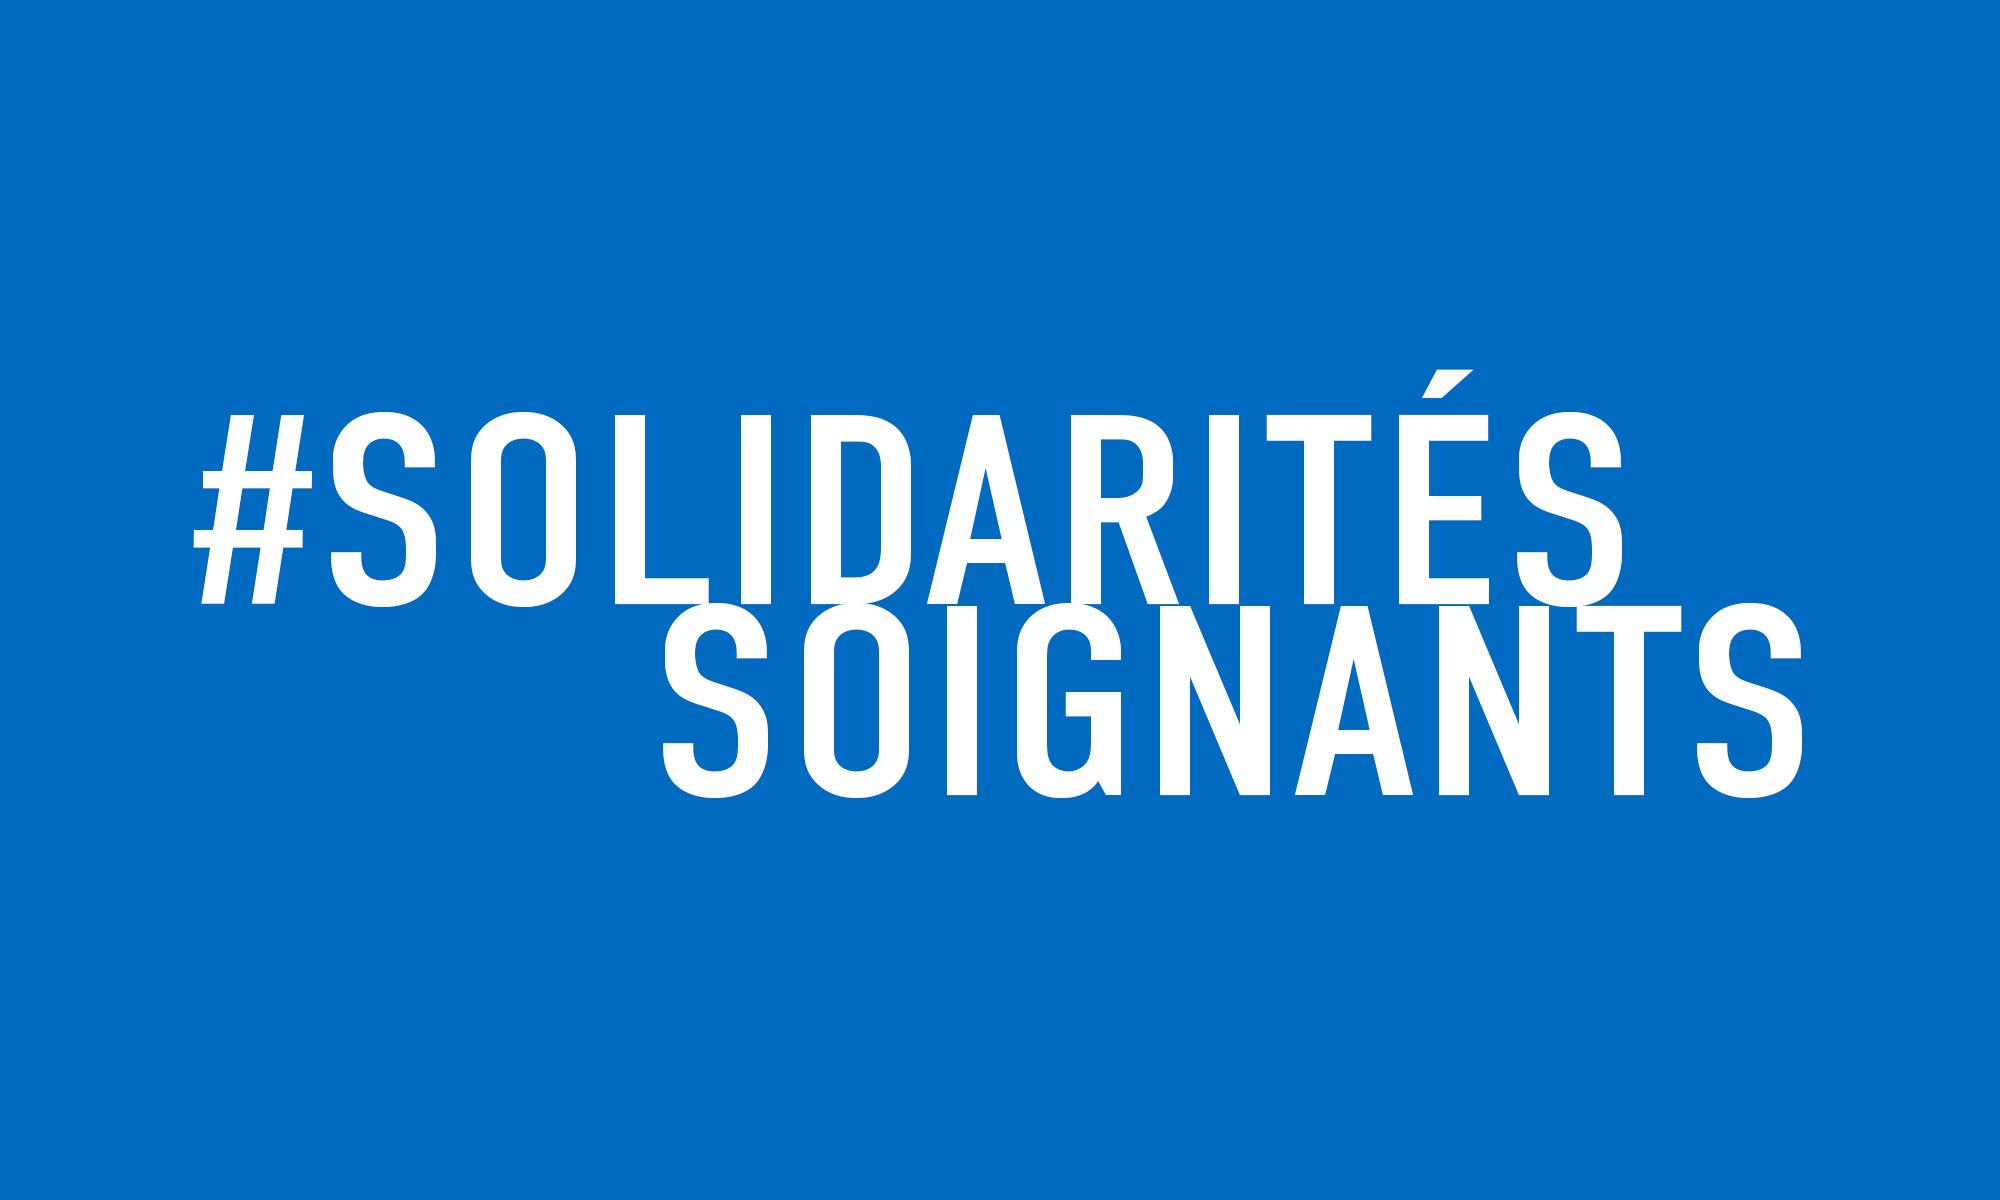 #SOLIDARITESOIGNANTS